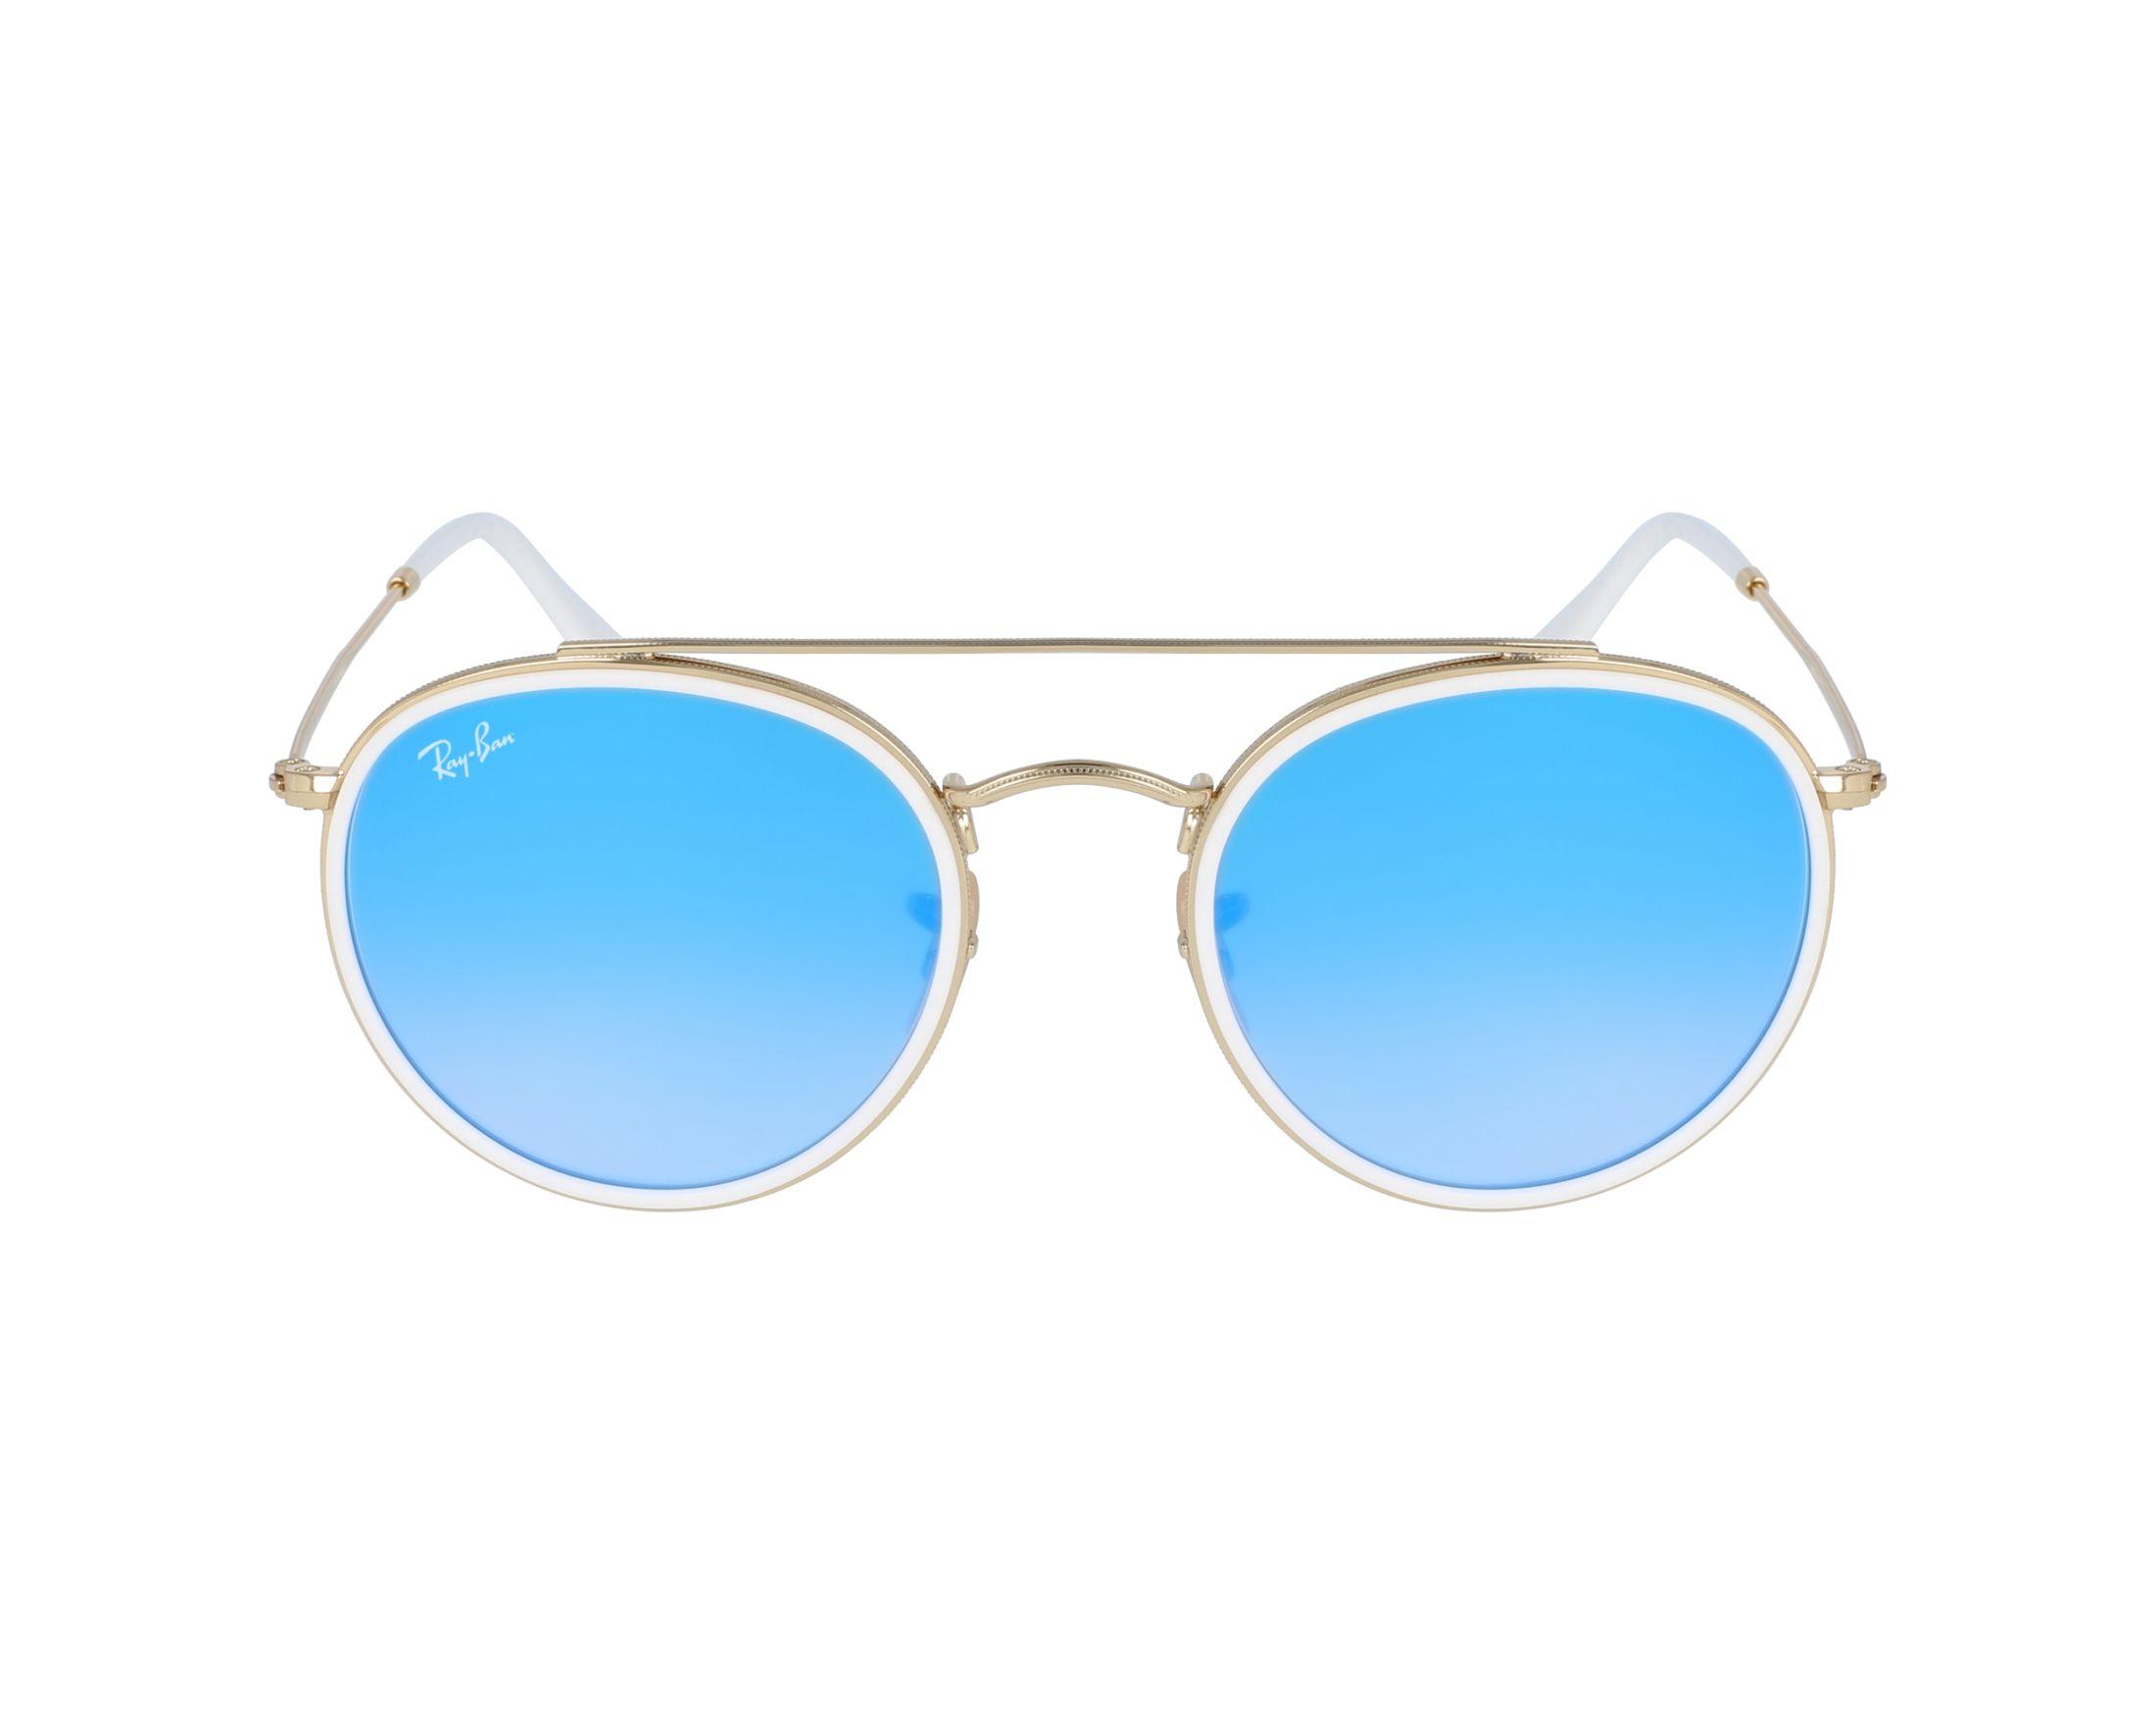 1b5d5b80611eb Sunglasses Ray-Ban RB-3647-N 001 4O - Gold White profile